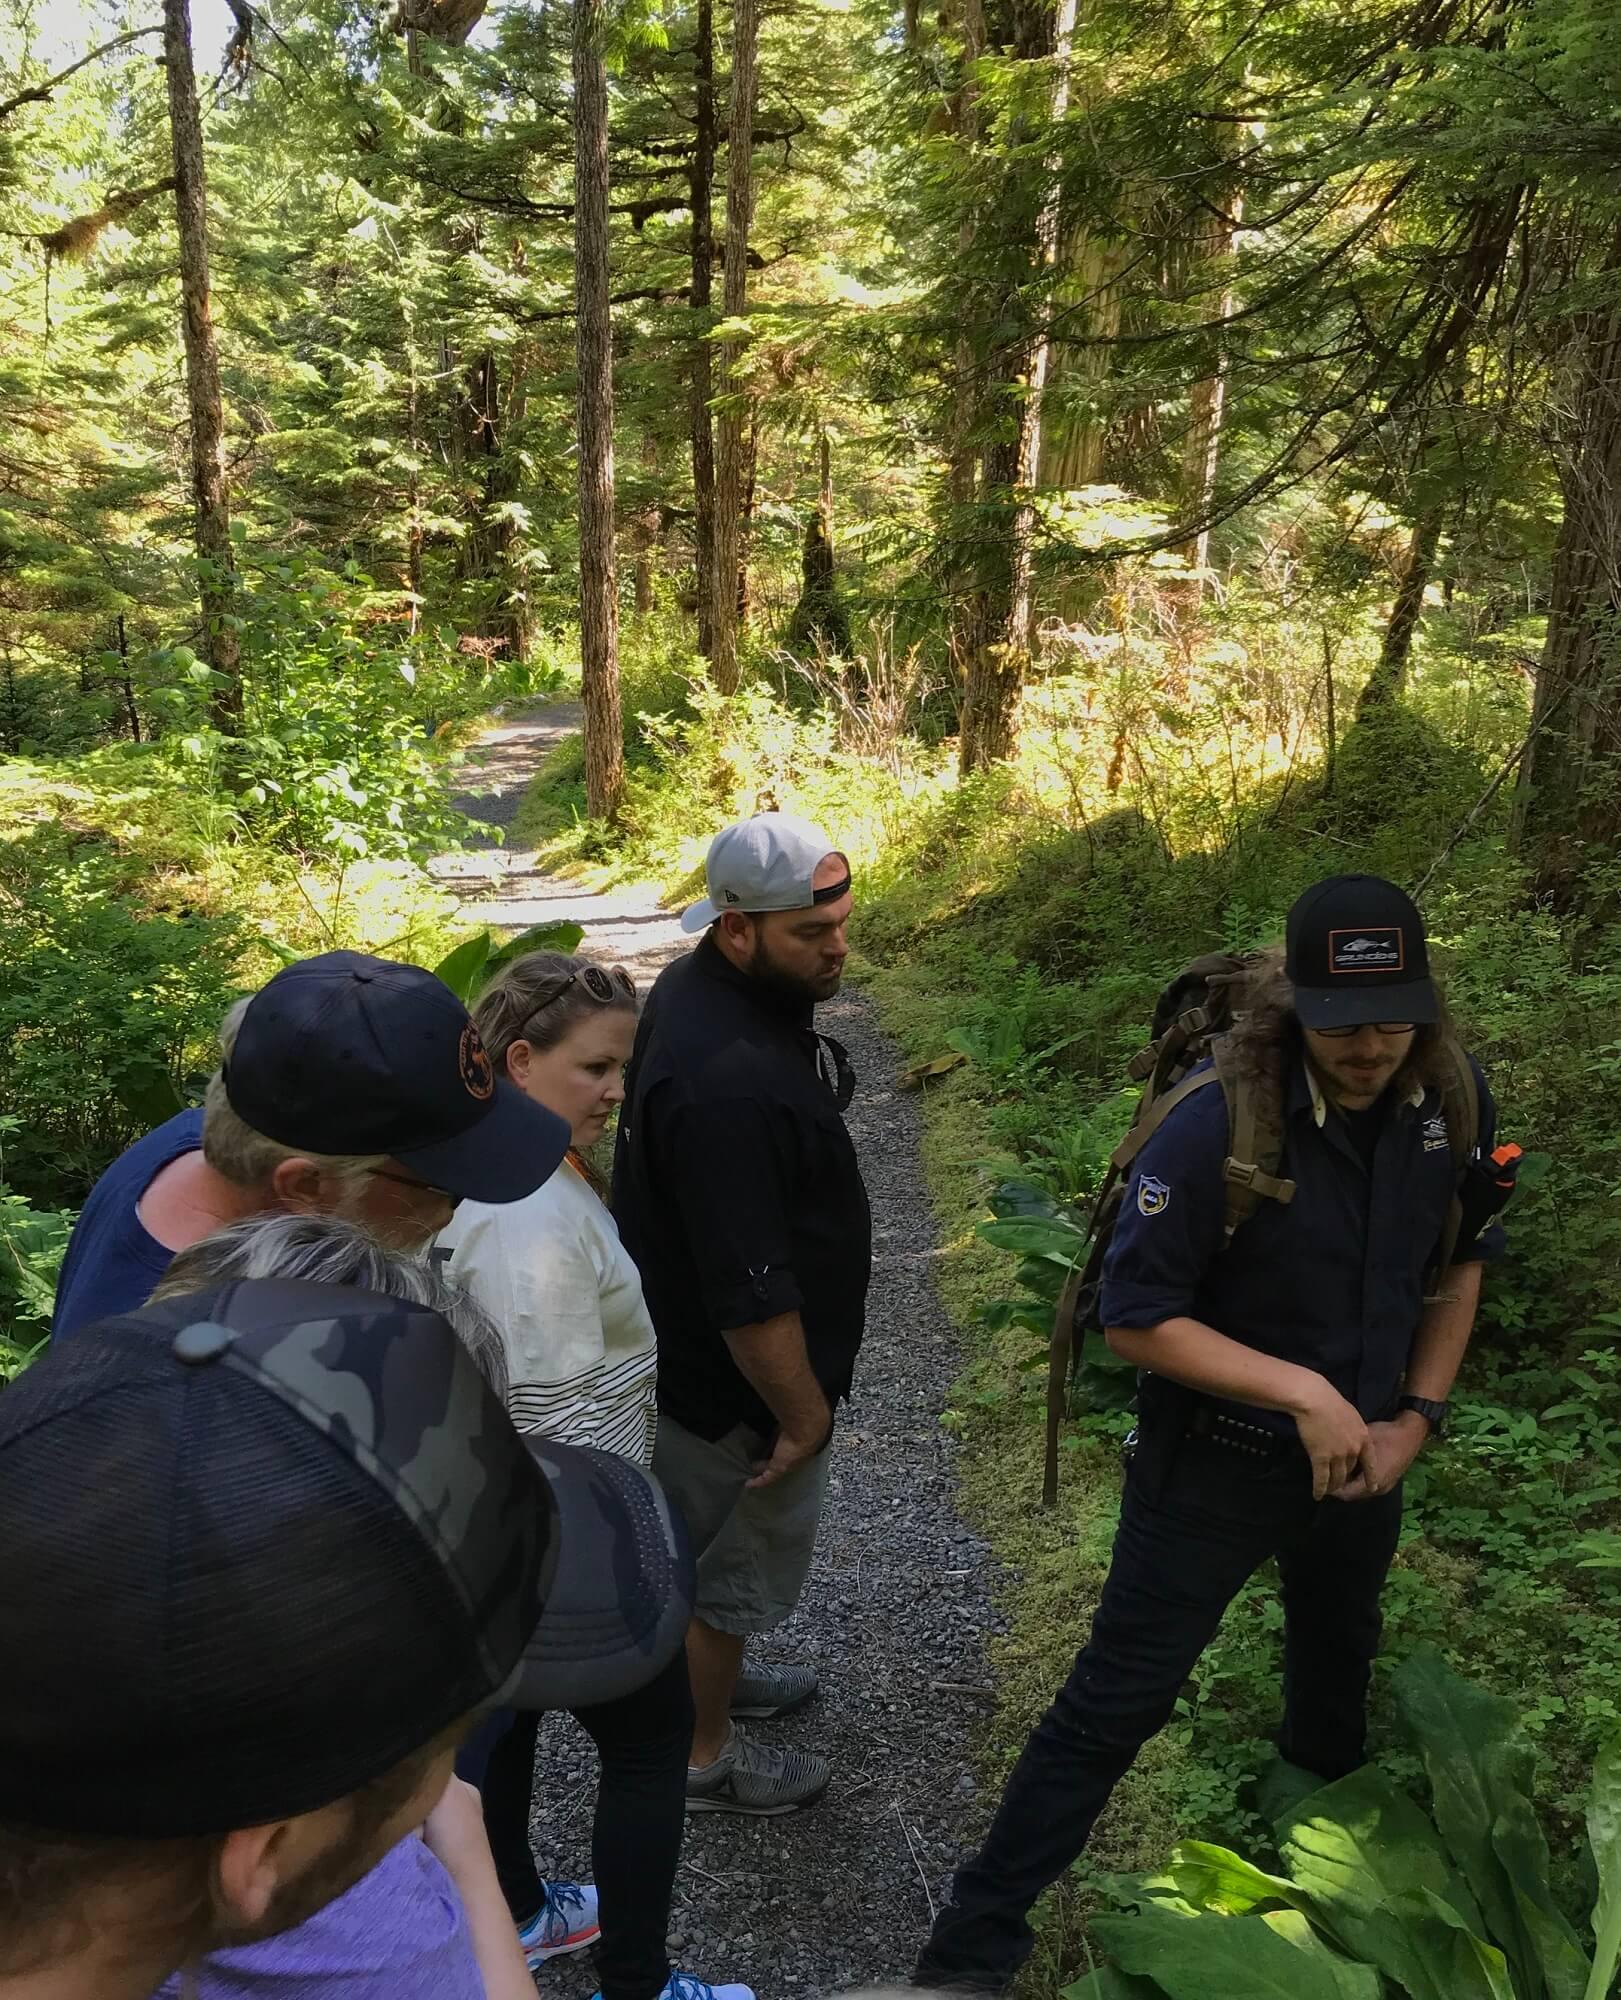 https://www.kawanti.com/wp-content/uploads/2018/10/Alaska-Bear-Trail-with-guide.jpeg